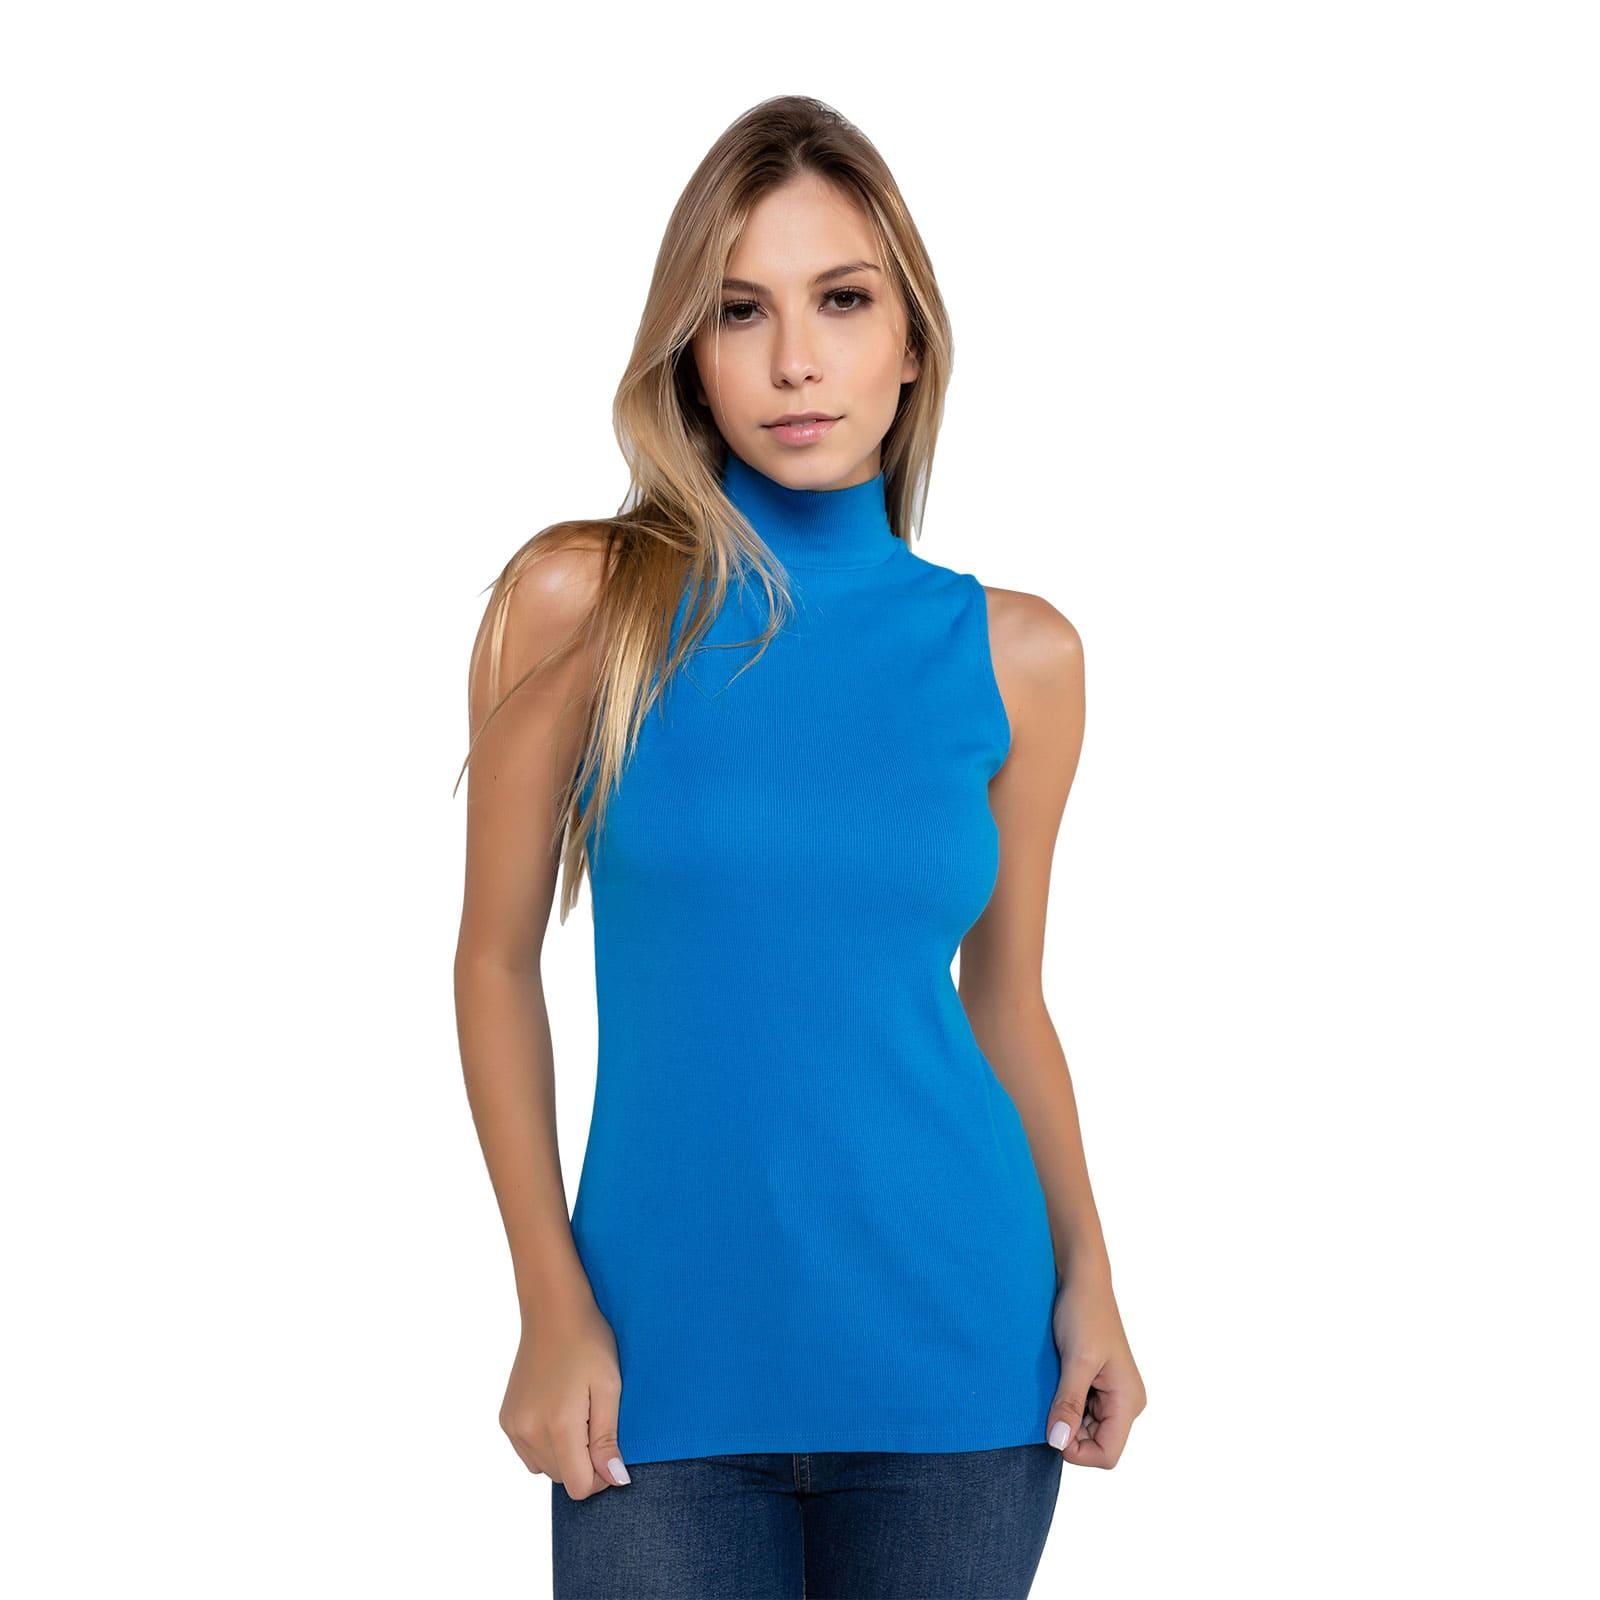 Blusa Feminina Gola Alta Azul